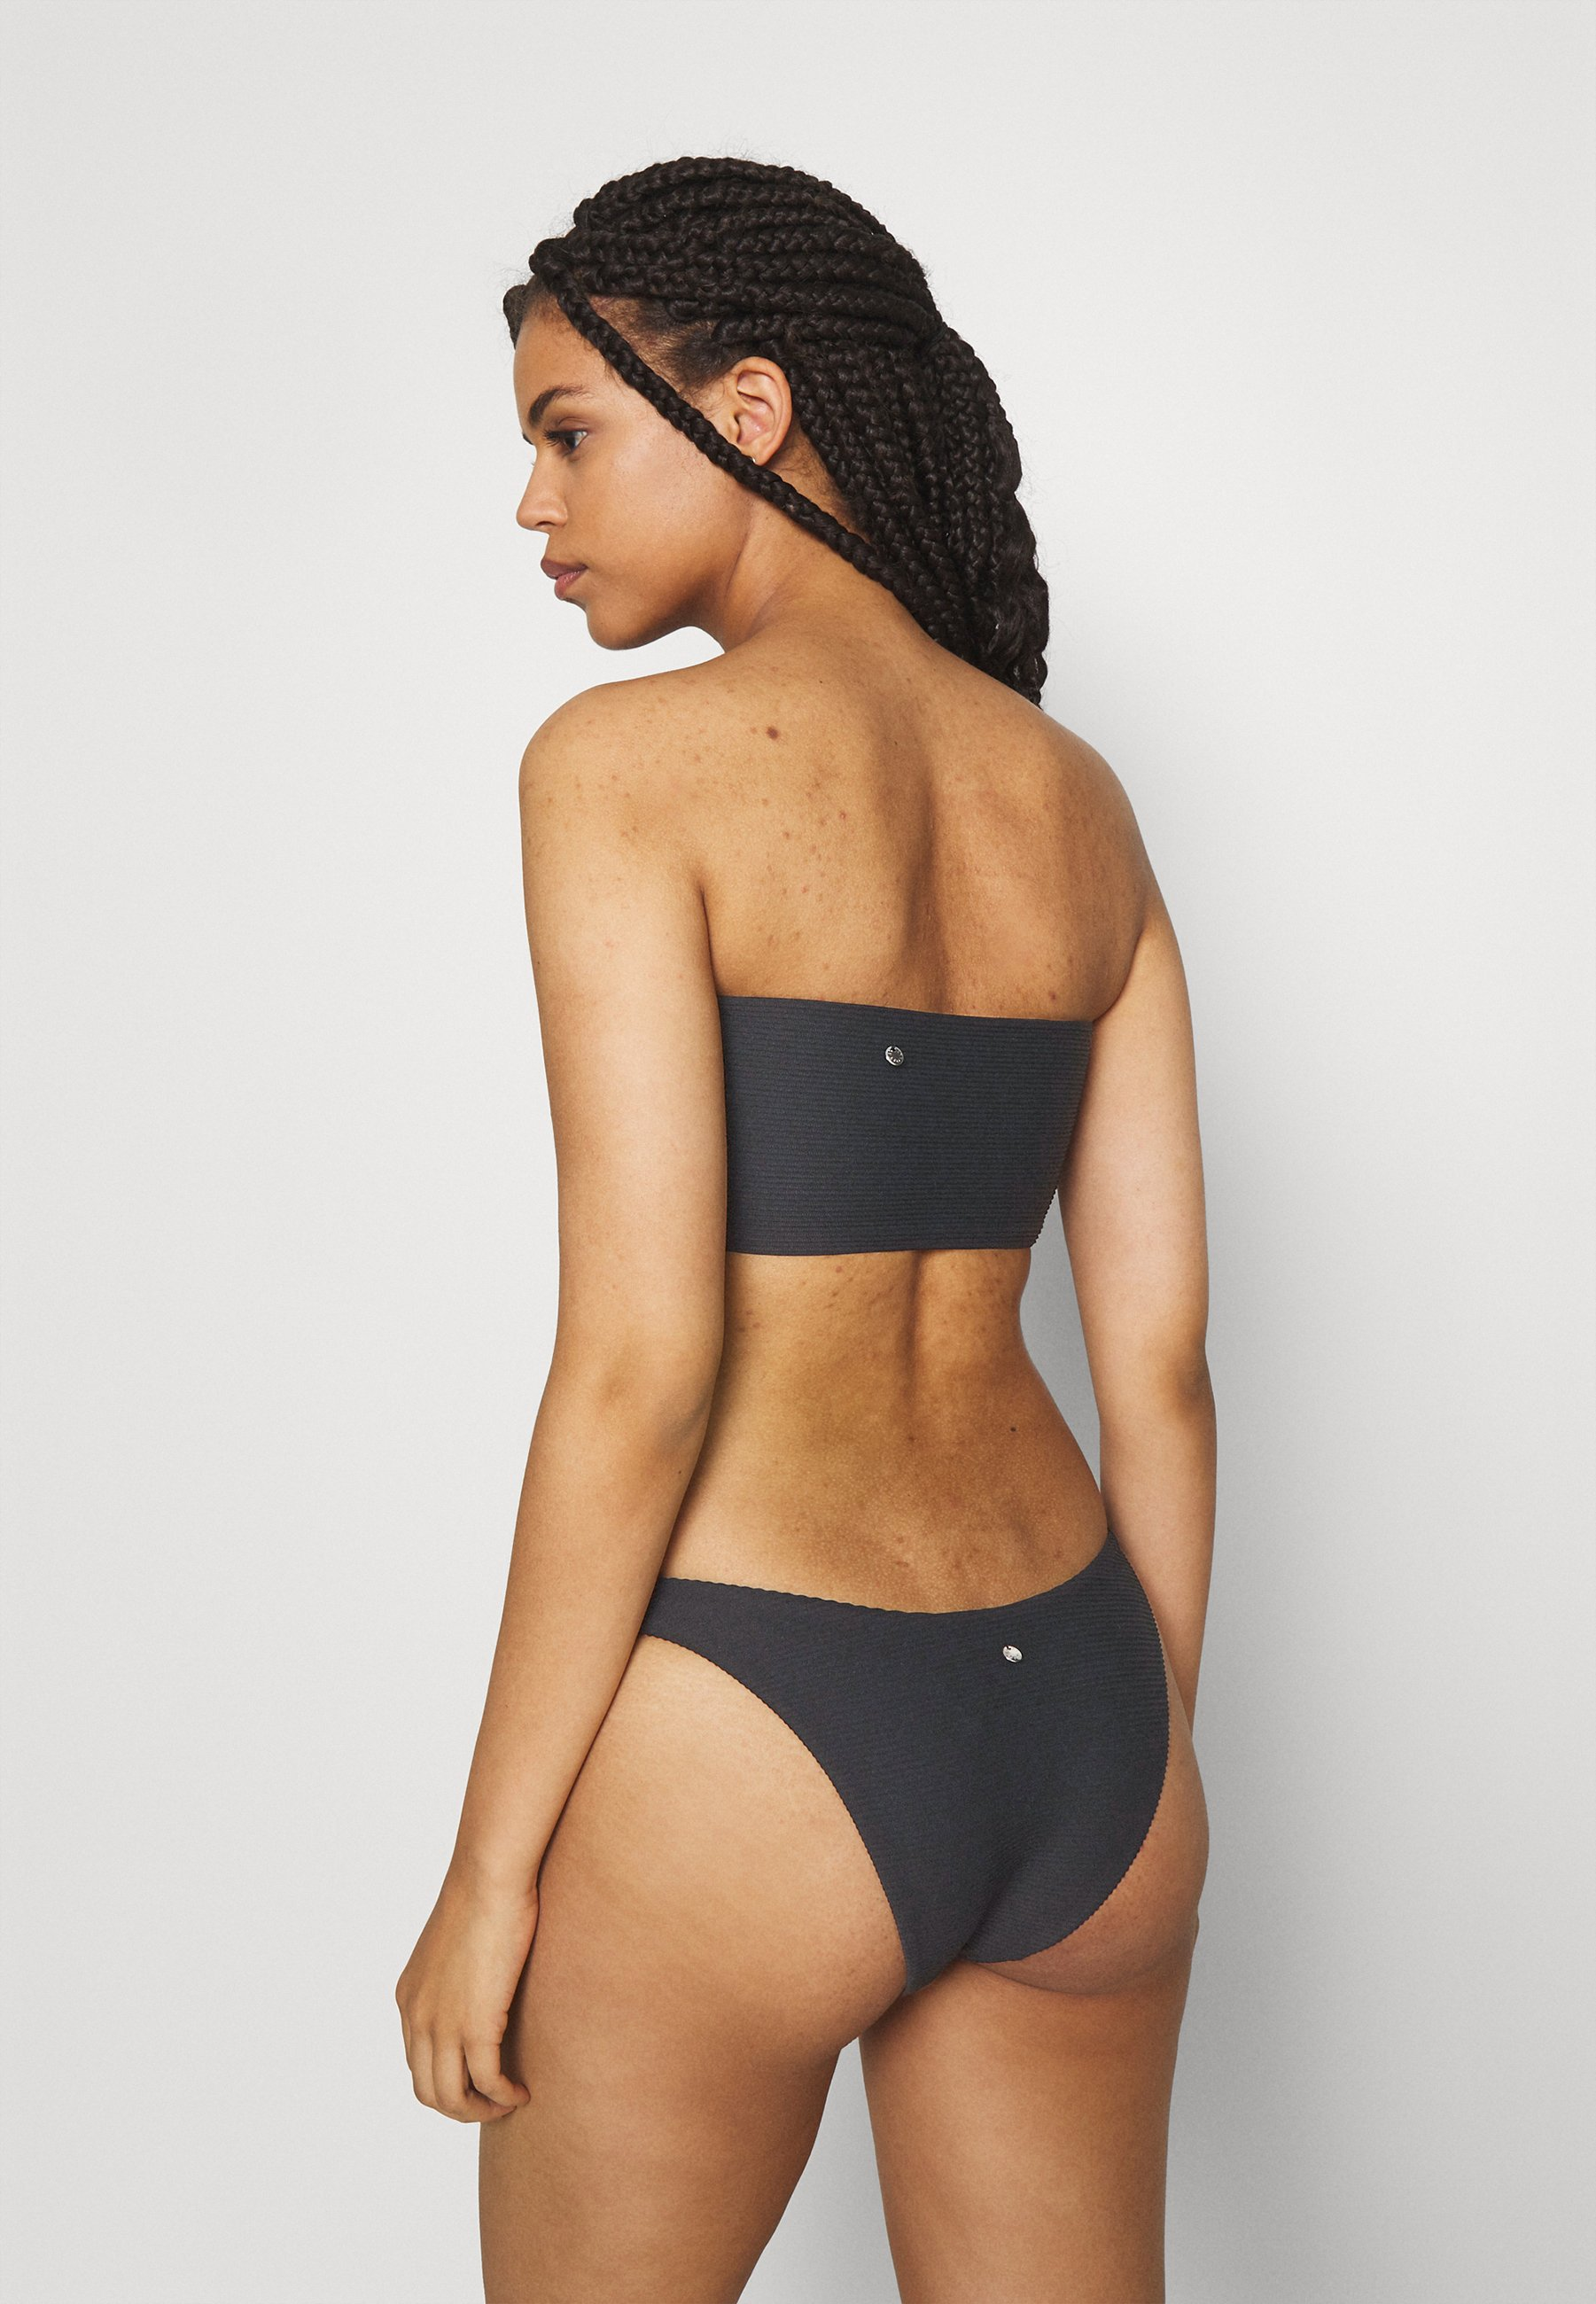 Donna ESSENTIALS HIGH CUT PANT - Bikini pezzo sotto